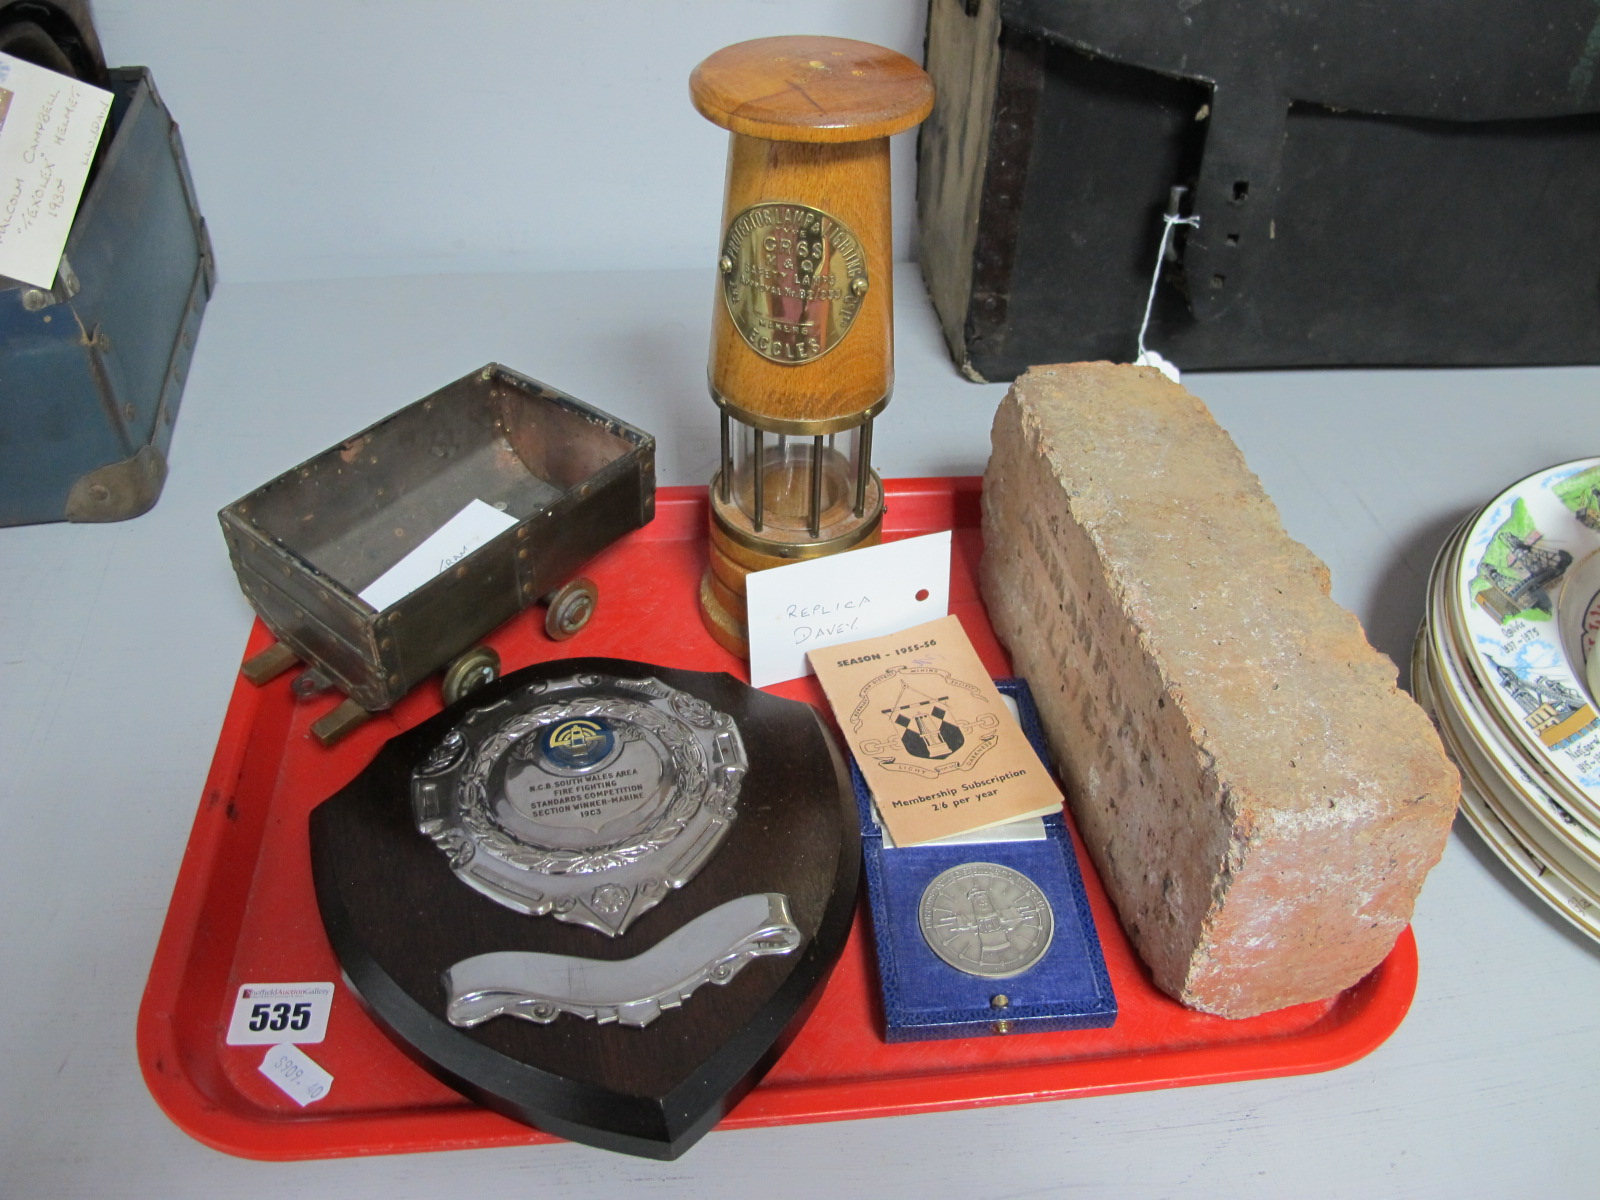 Mining Ephemera. Replica Davey Lamp, First Aid Medal, Fire Fighting Plaque. Burnley Mining Society